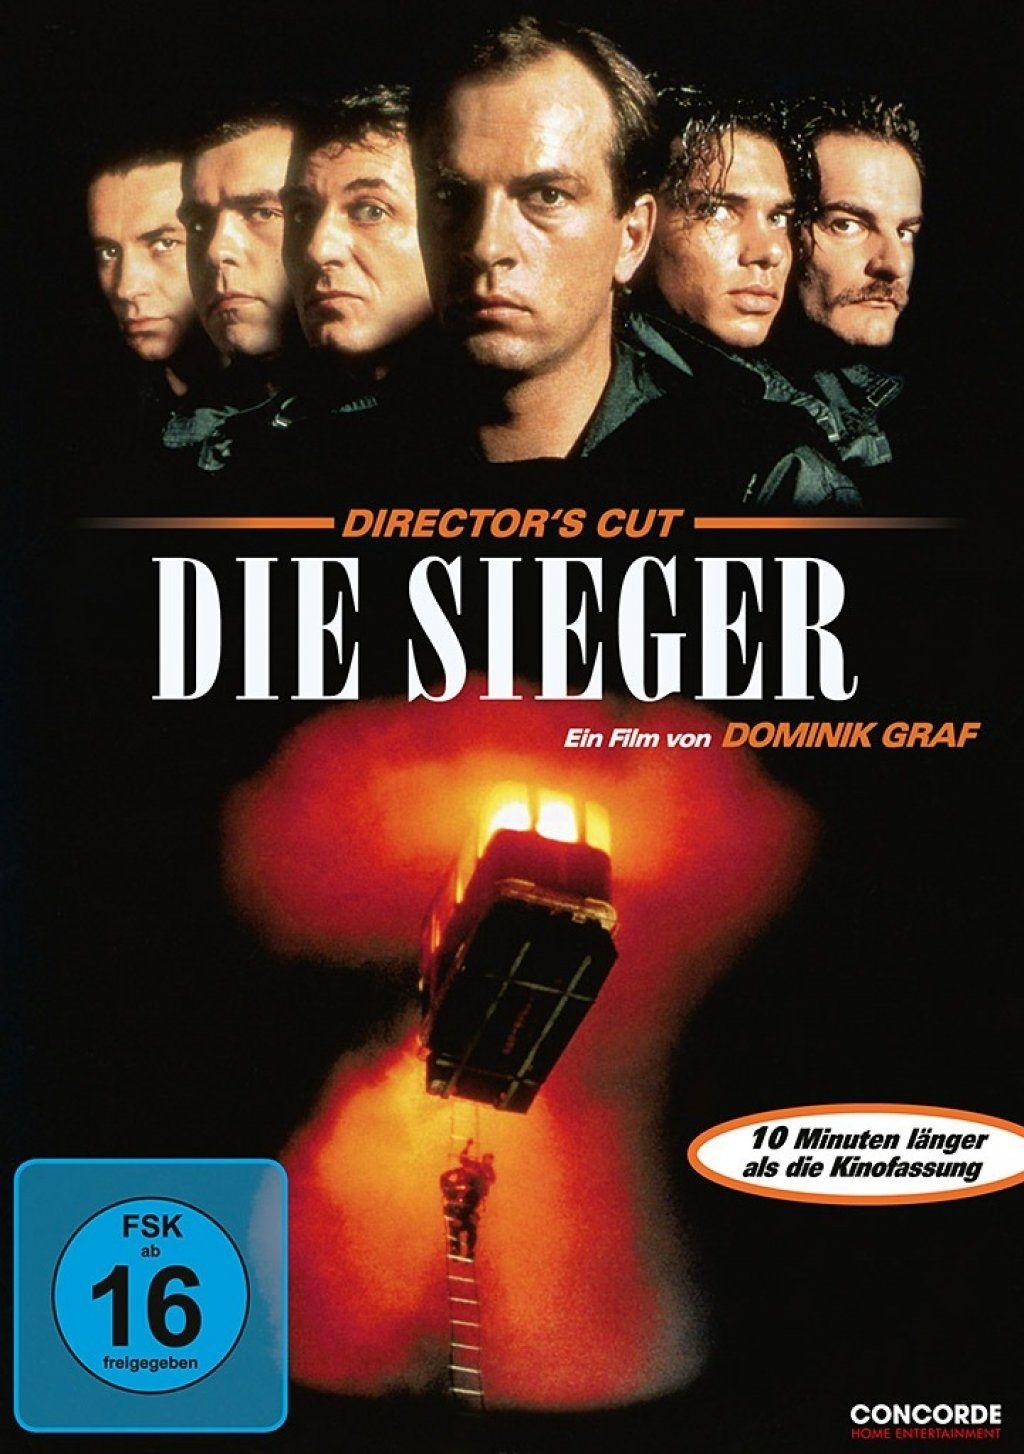 Sieger, Die (Director's Cut)